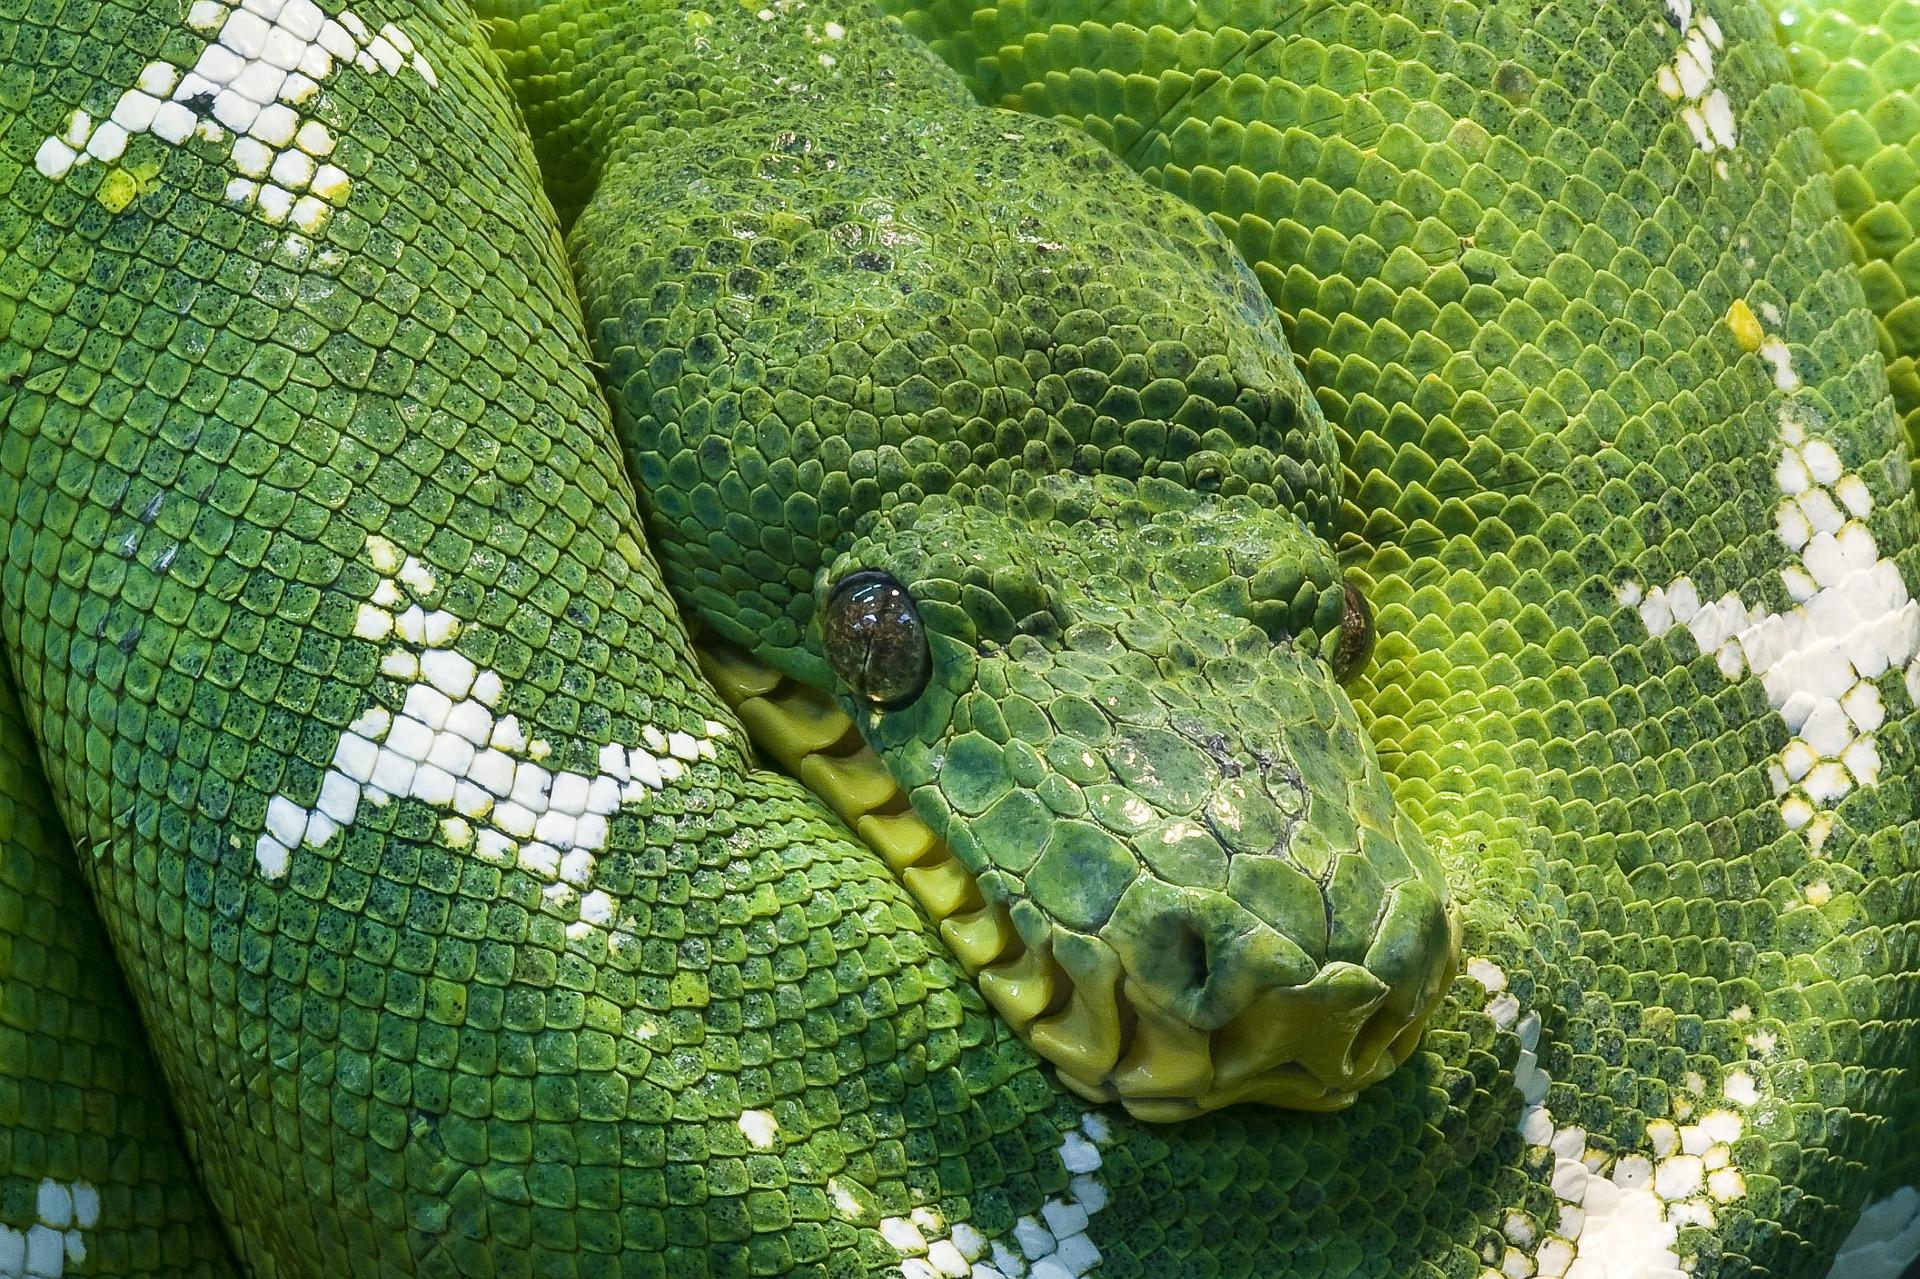 Grüner Baumpython - green tree python